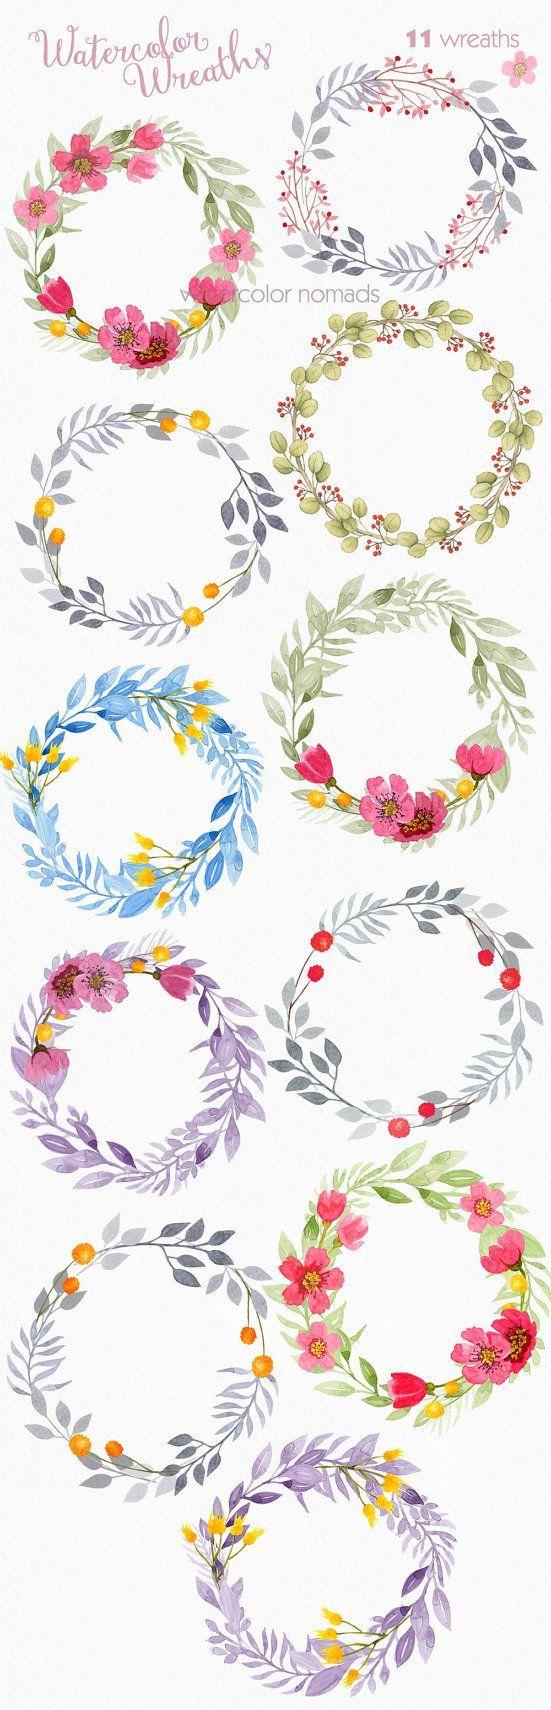 Glitch clipart little flower Graphic Pinterest download instant watercolor